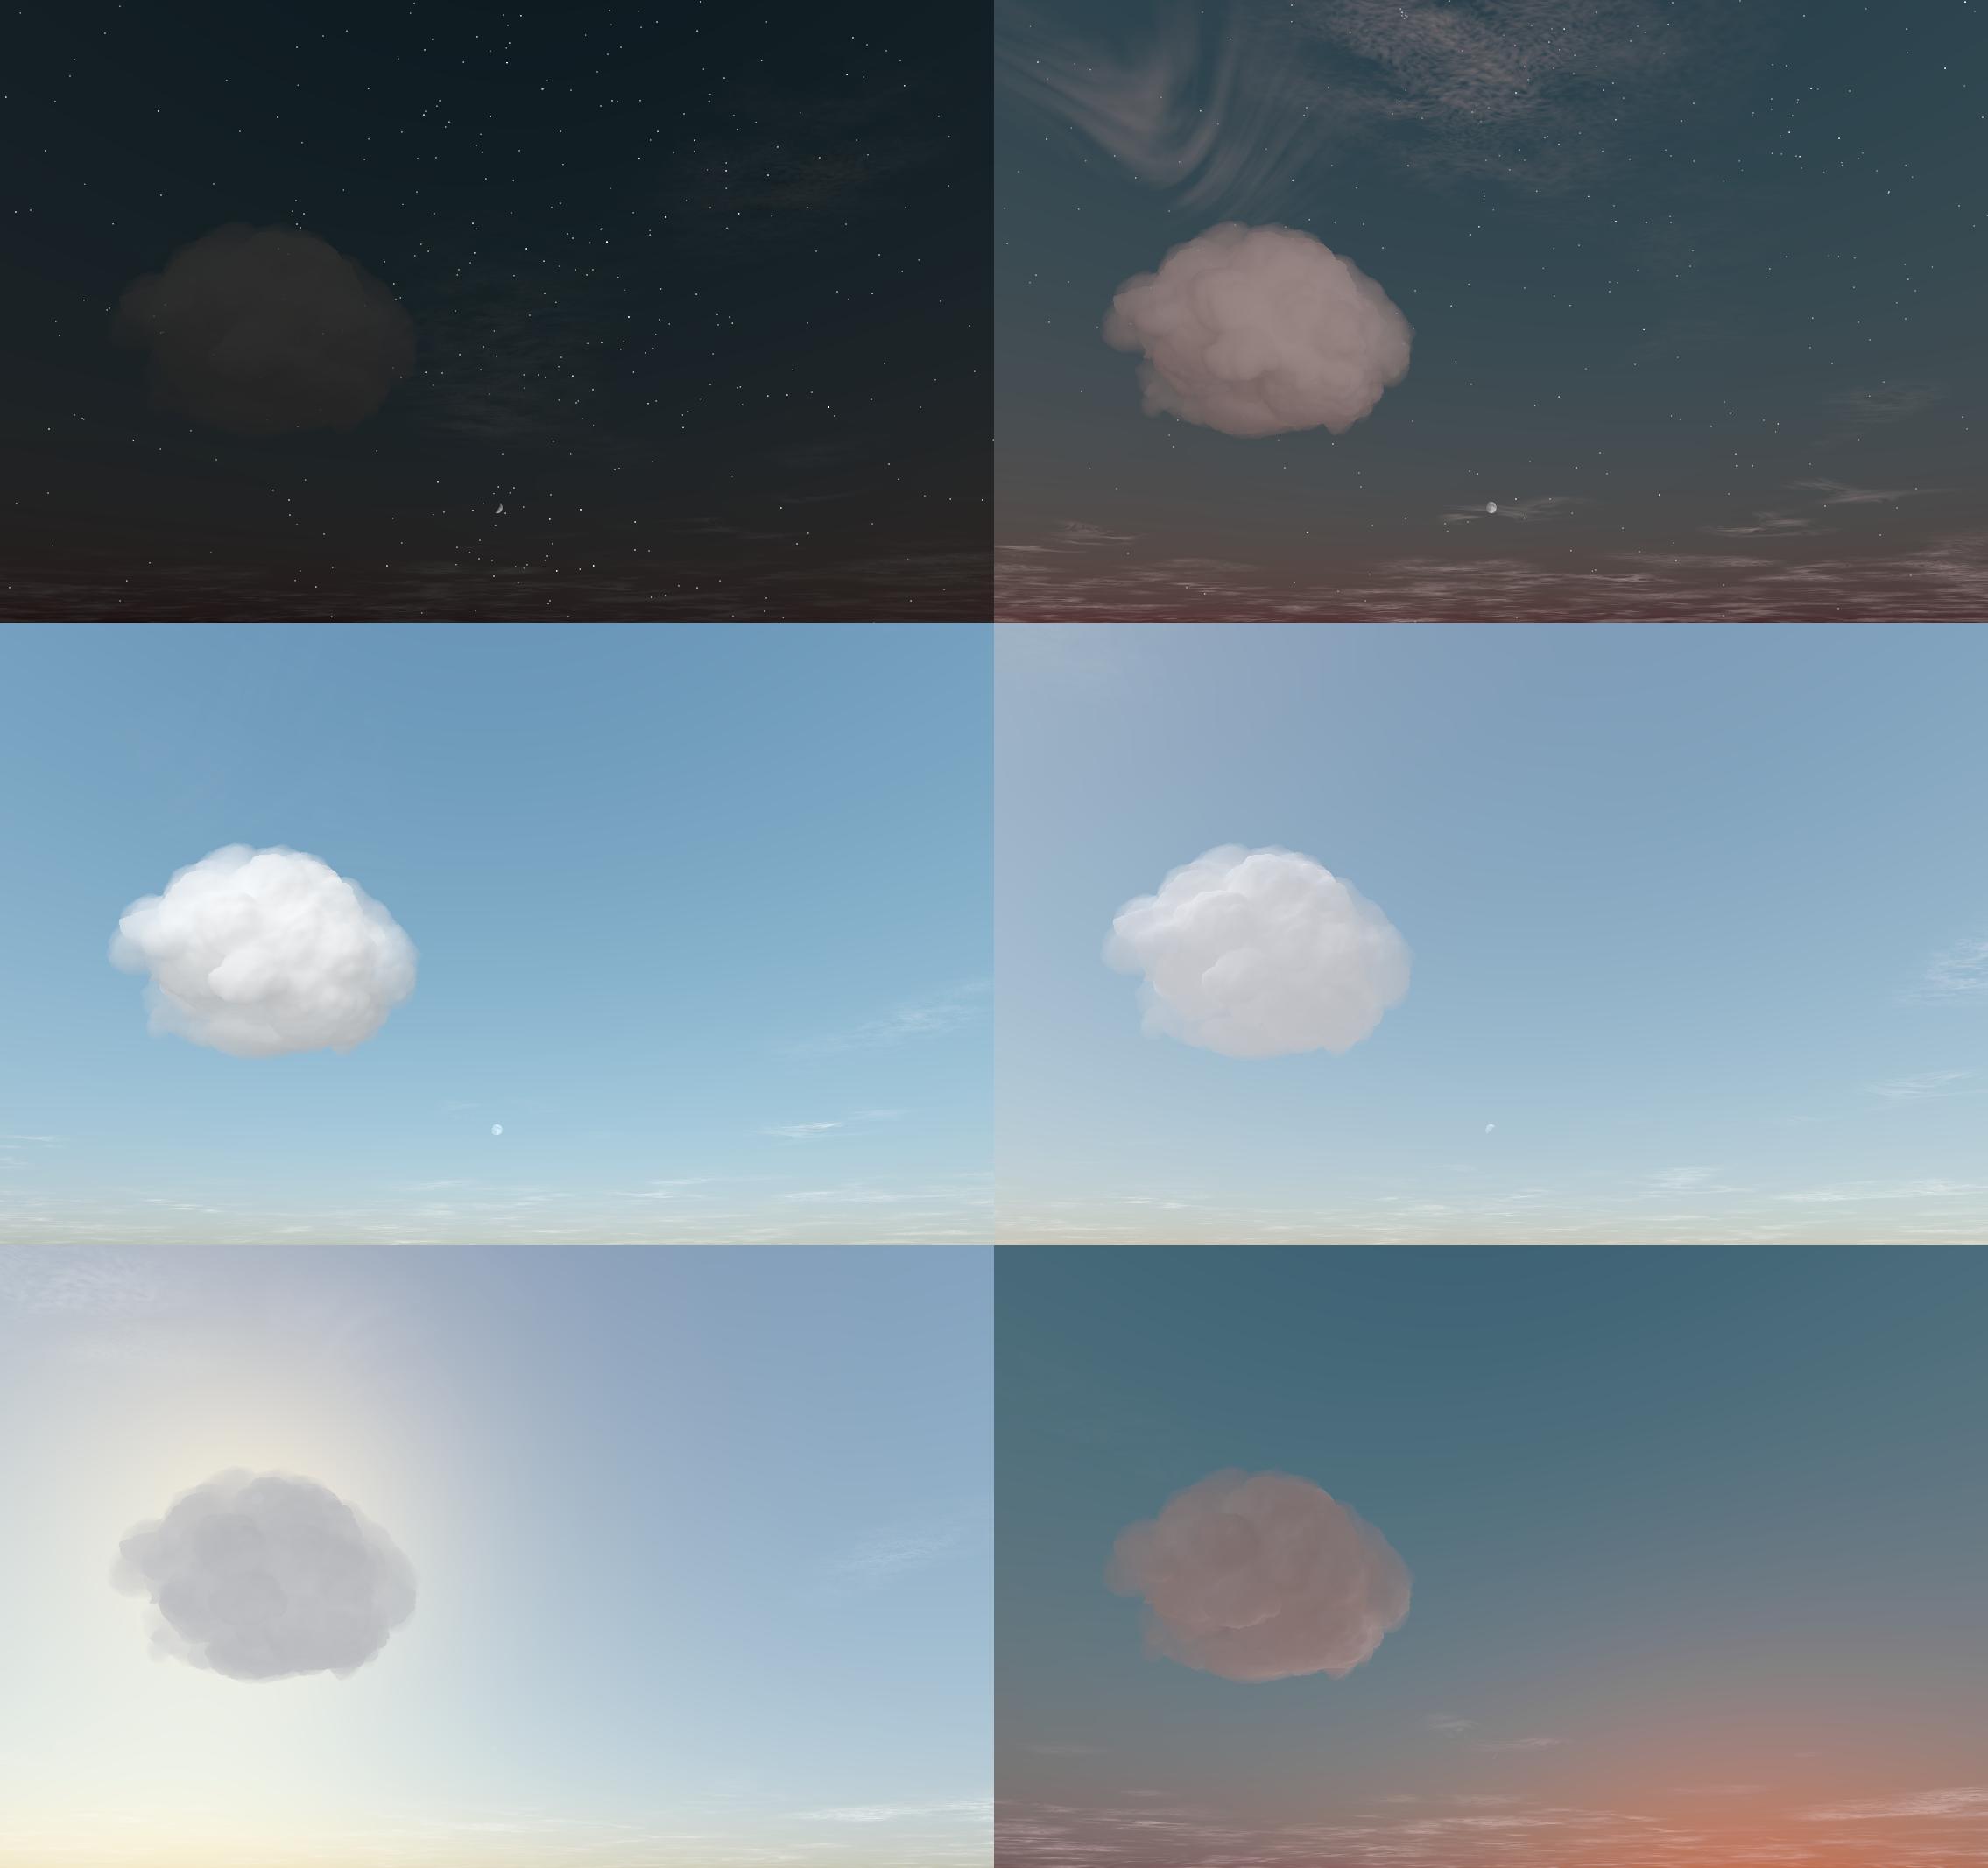 Realtime_cloud.png